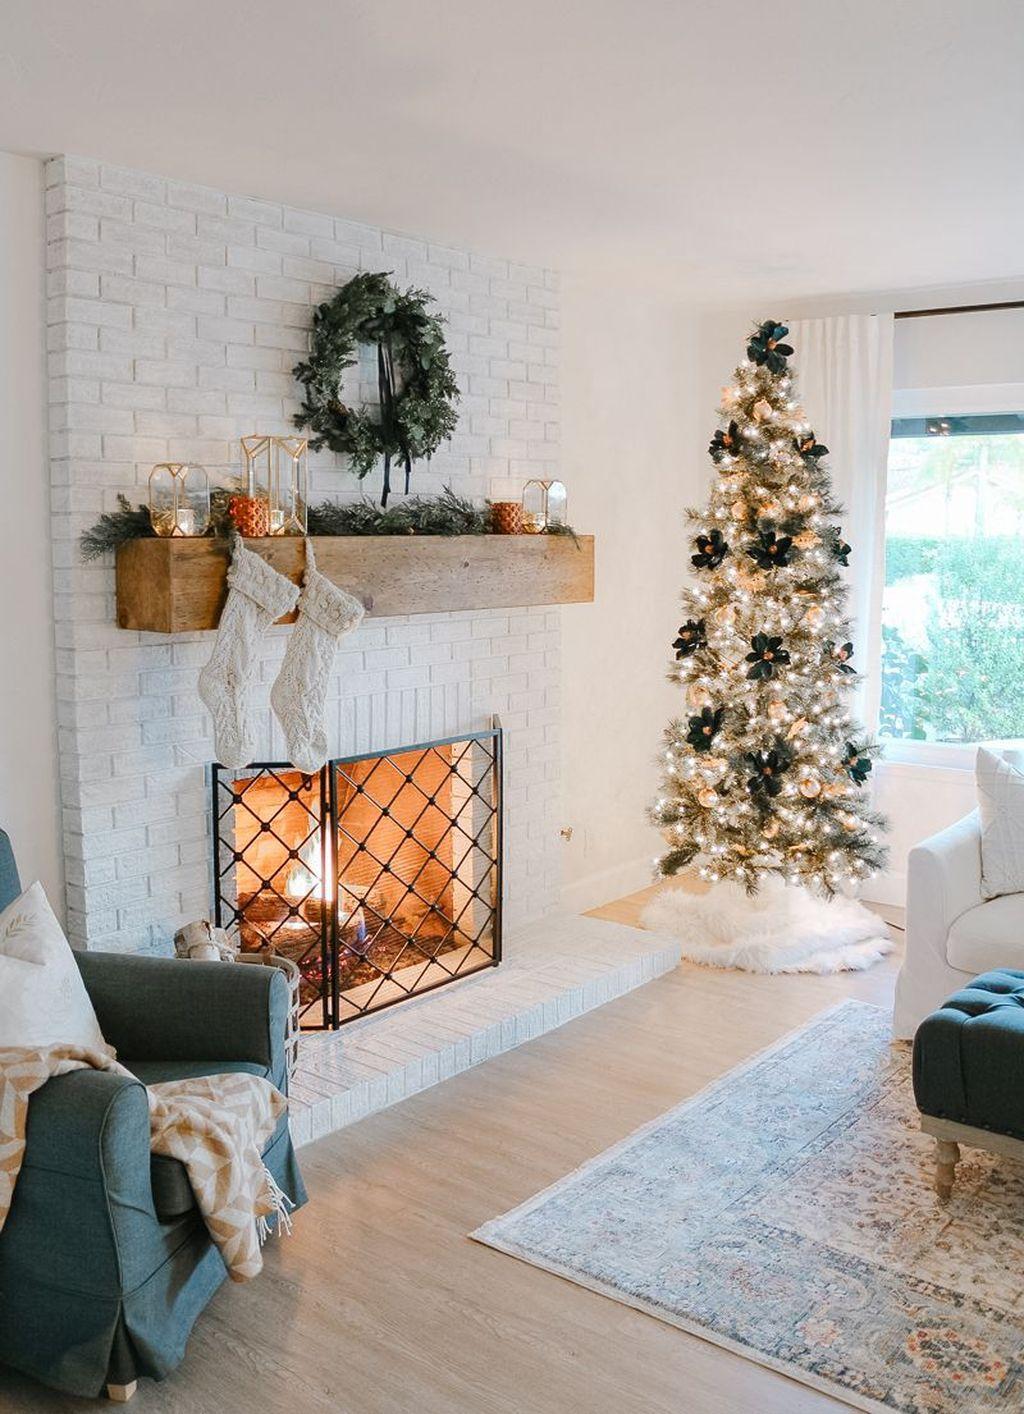 55 Small Apartment Christmas Tree Living Room Decor Ideas #smallapartmentlivingroom